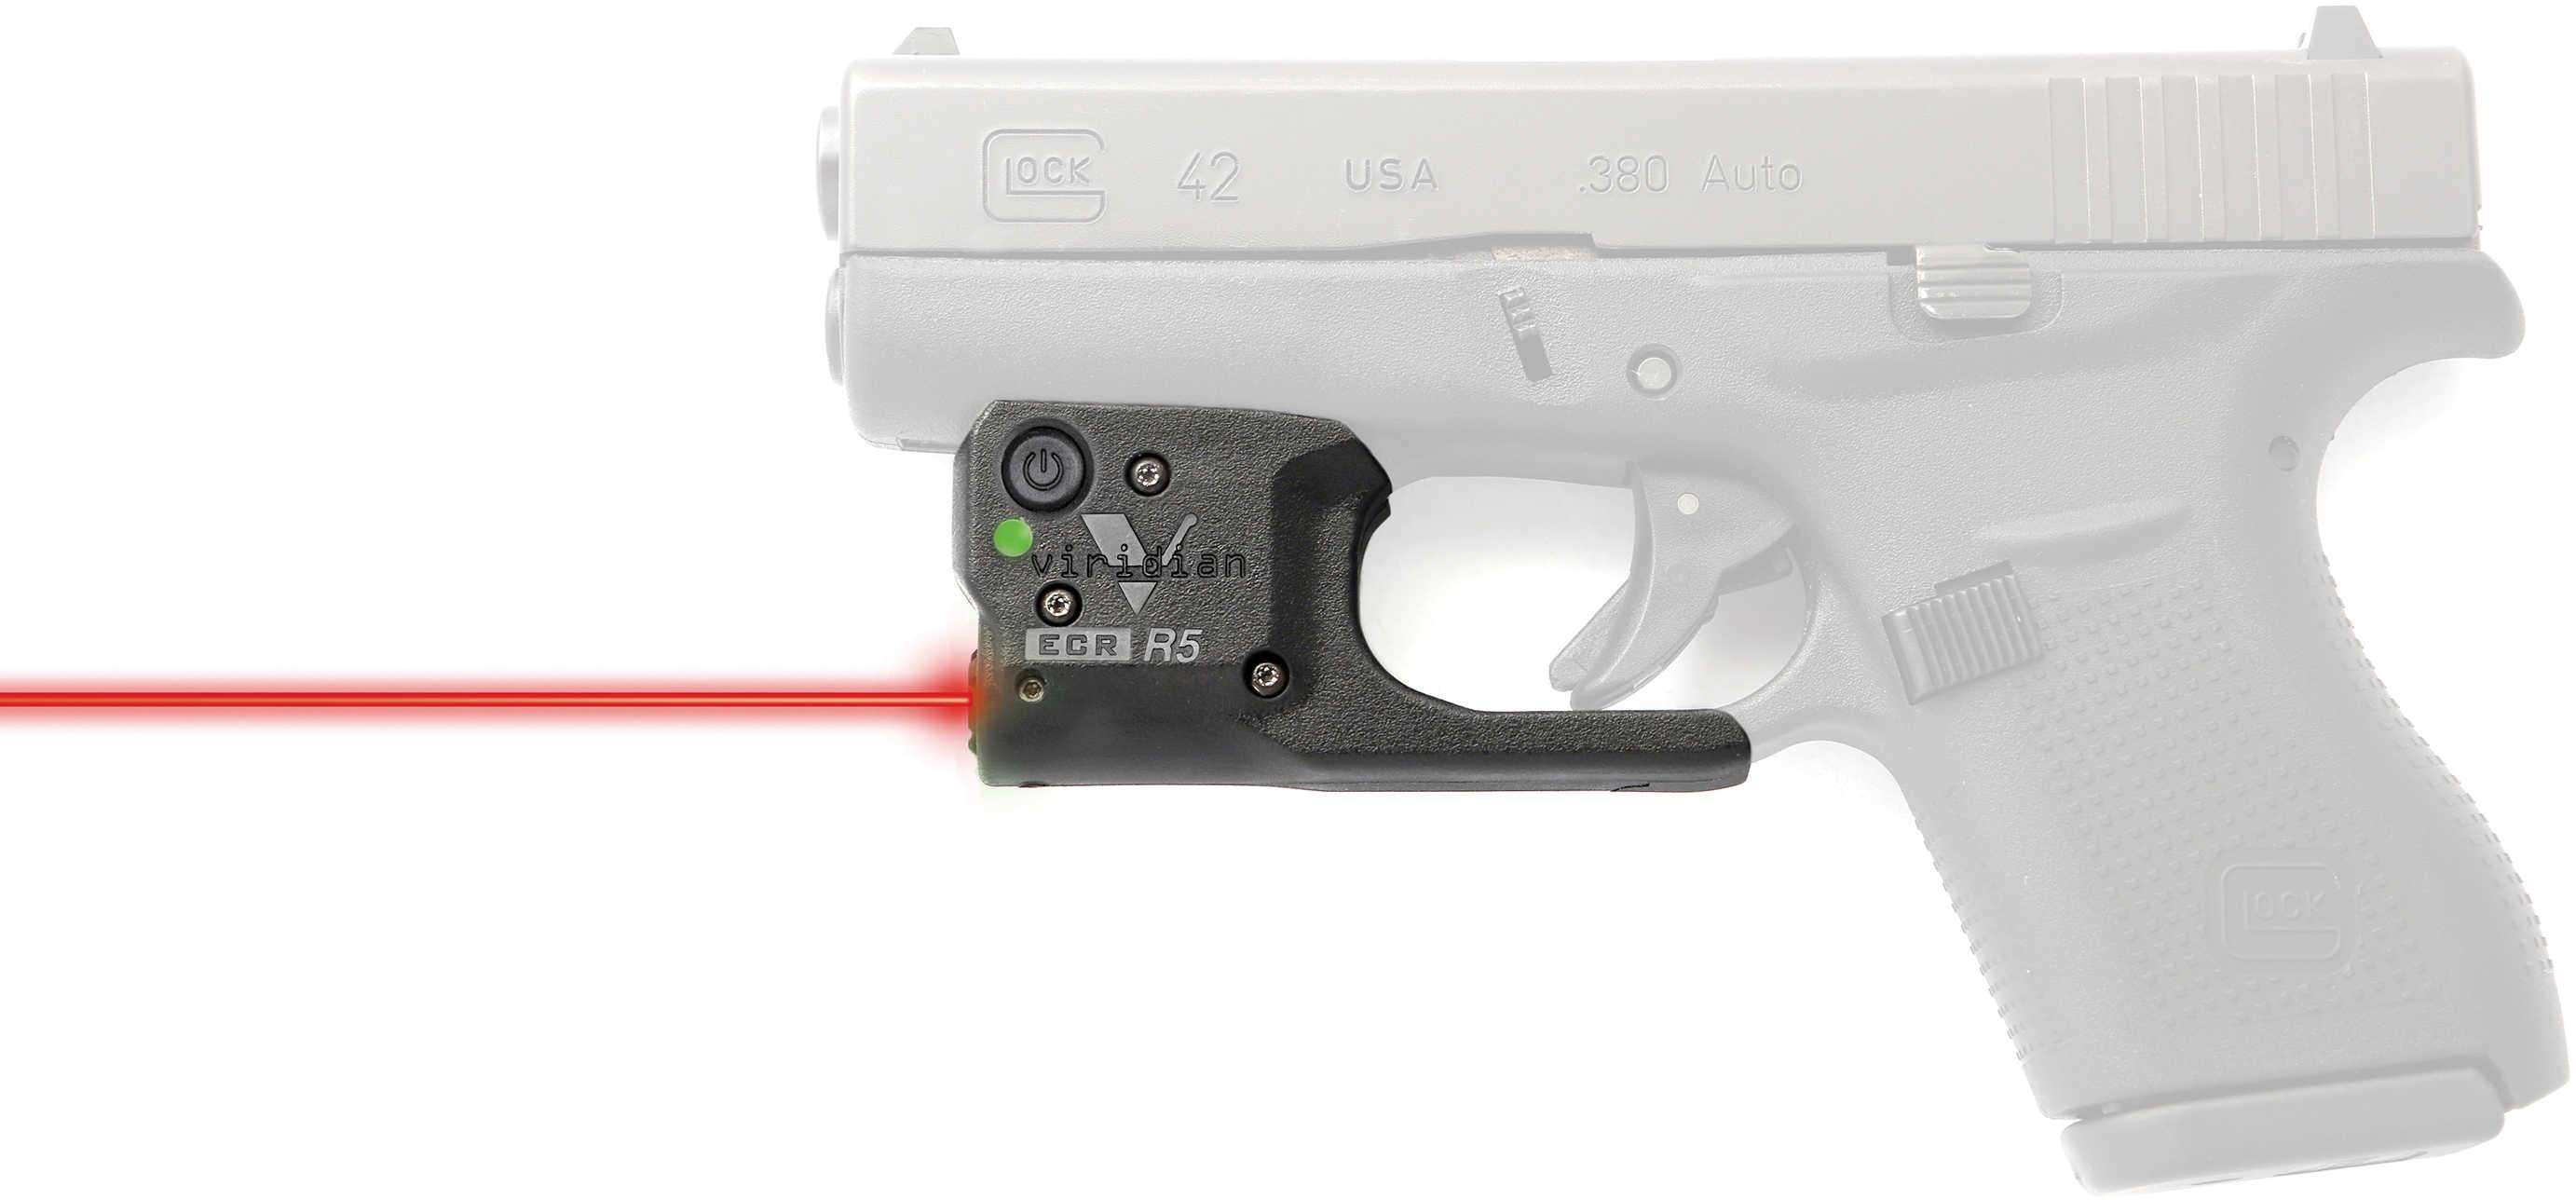 Reactor 5 Gen II Red Laser Glock 42 with ECR Instant On Holster, Black